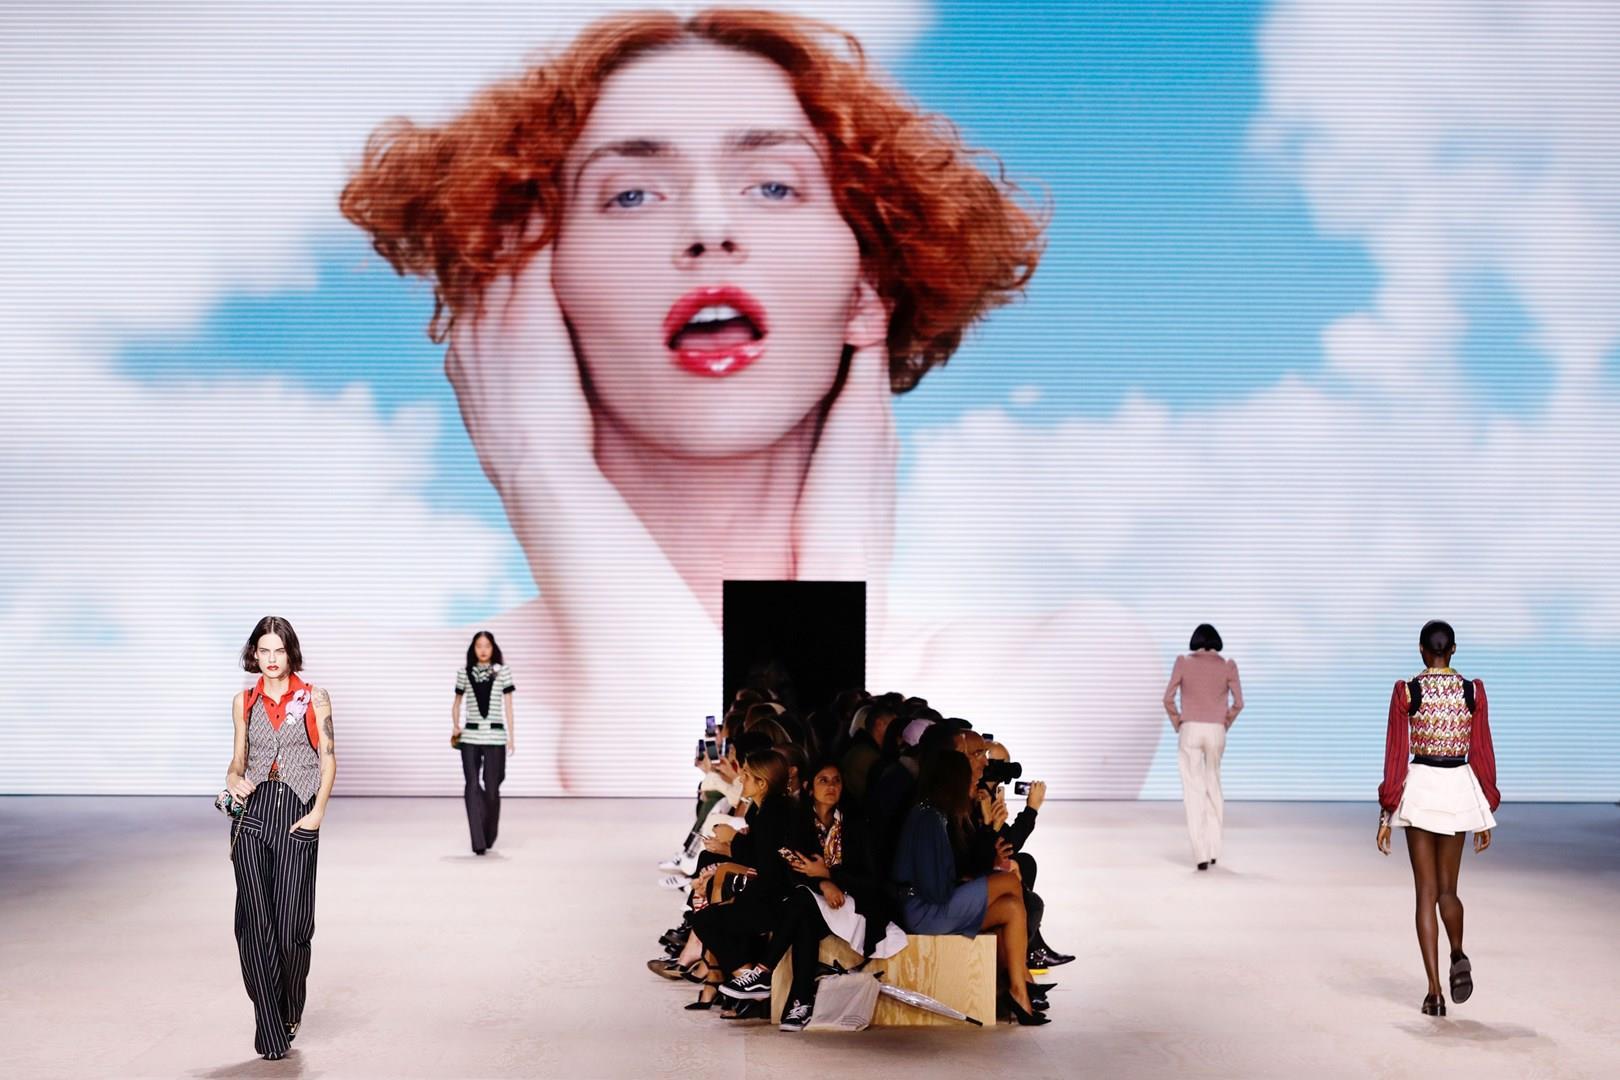 Le modelle Louis Vuitton in passerella